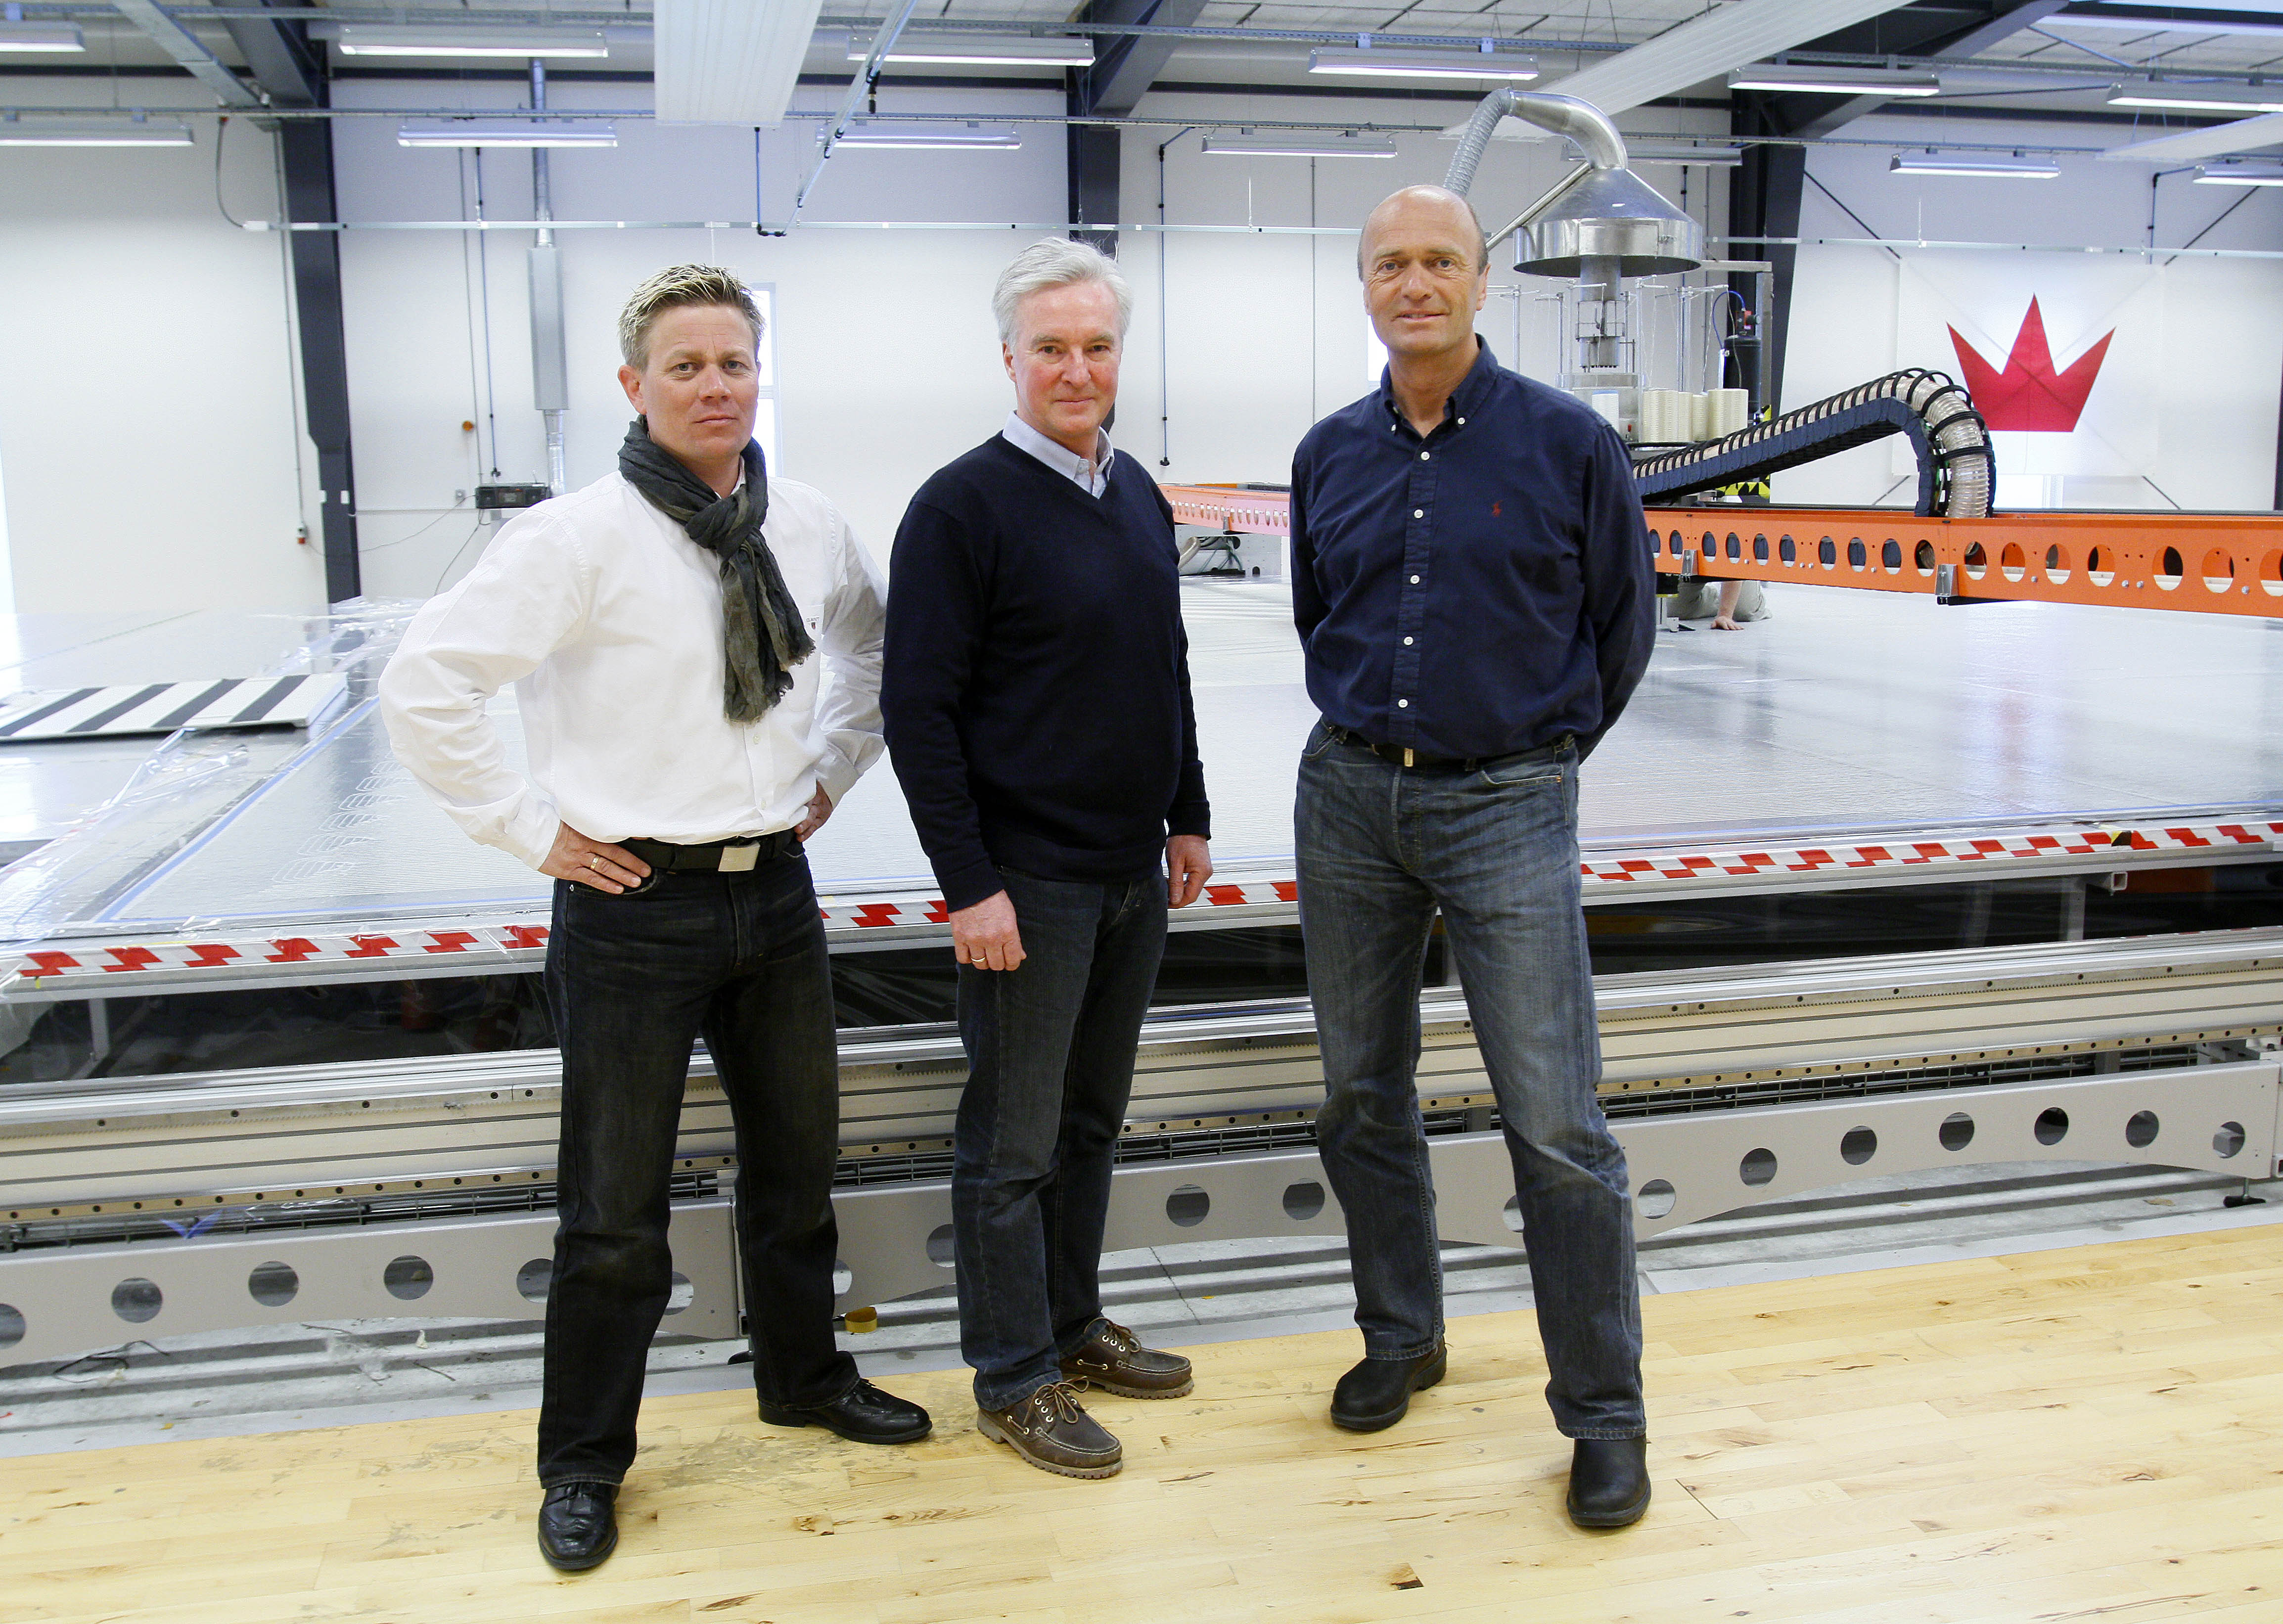 Fra venstre: Espen Kamperhaug, Claus Landmark og Jesper Bank. Foto: Mick Anderson/Sailingpix